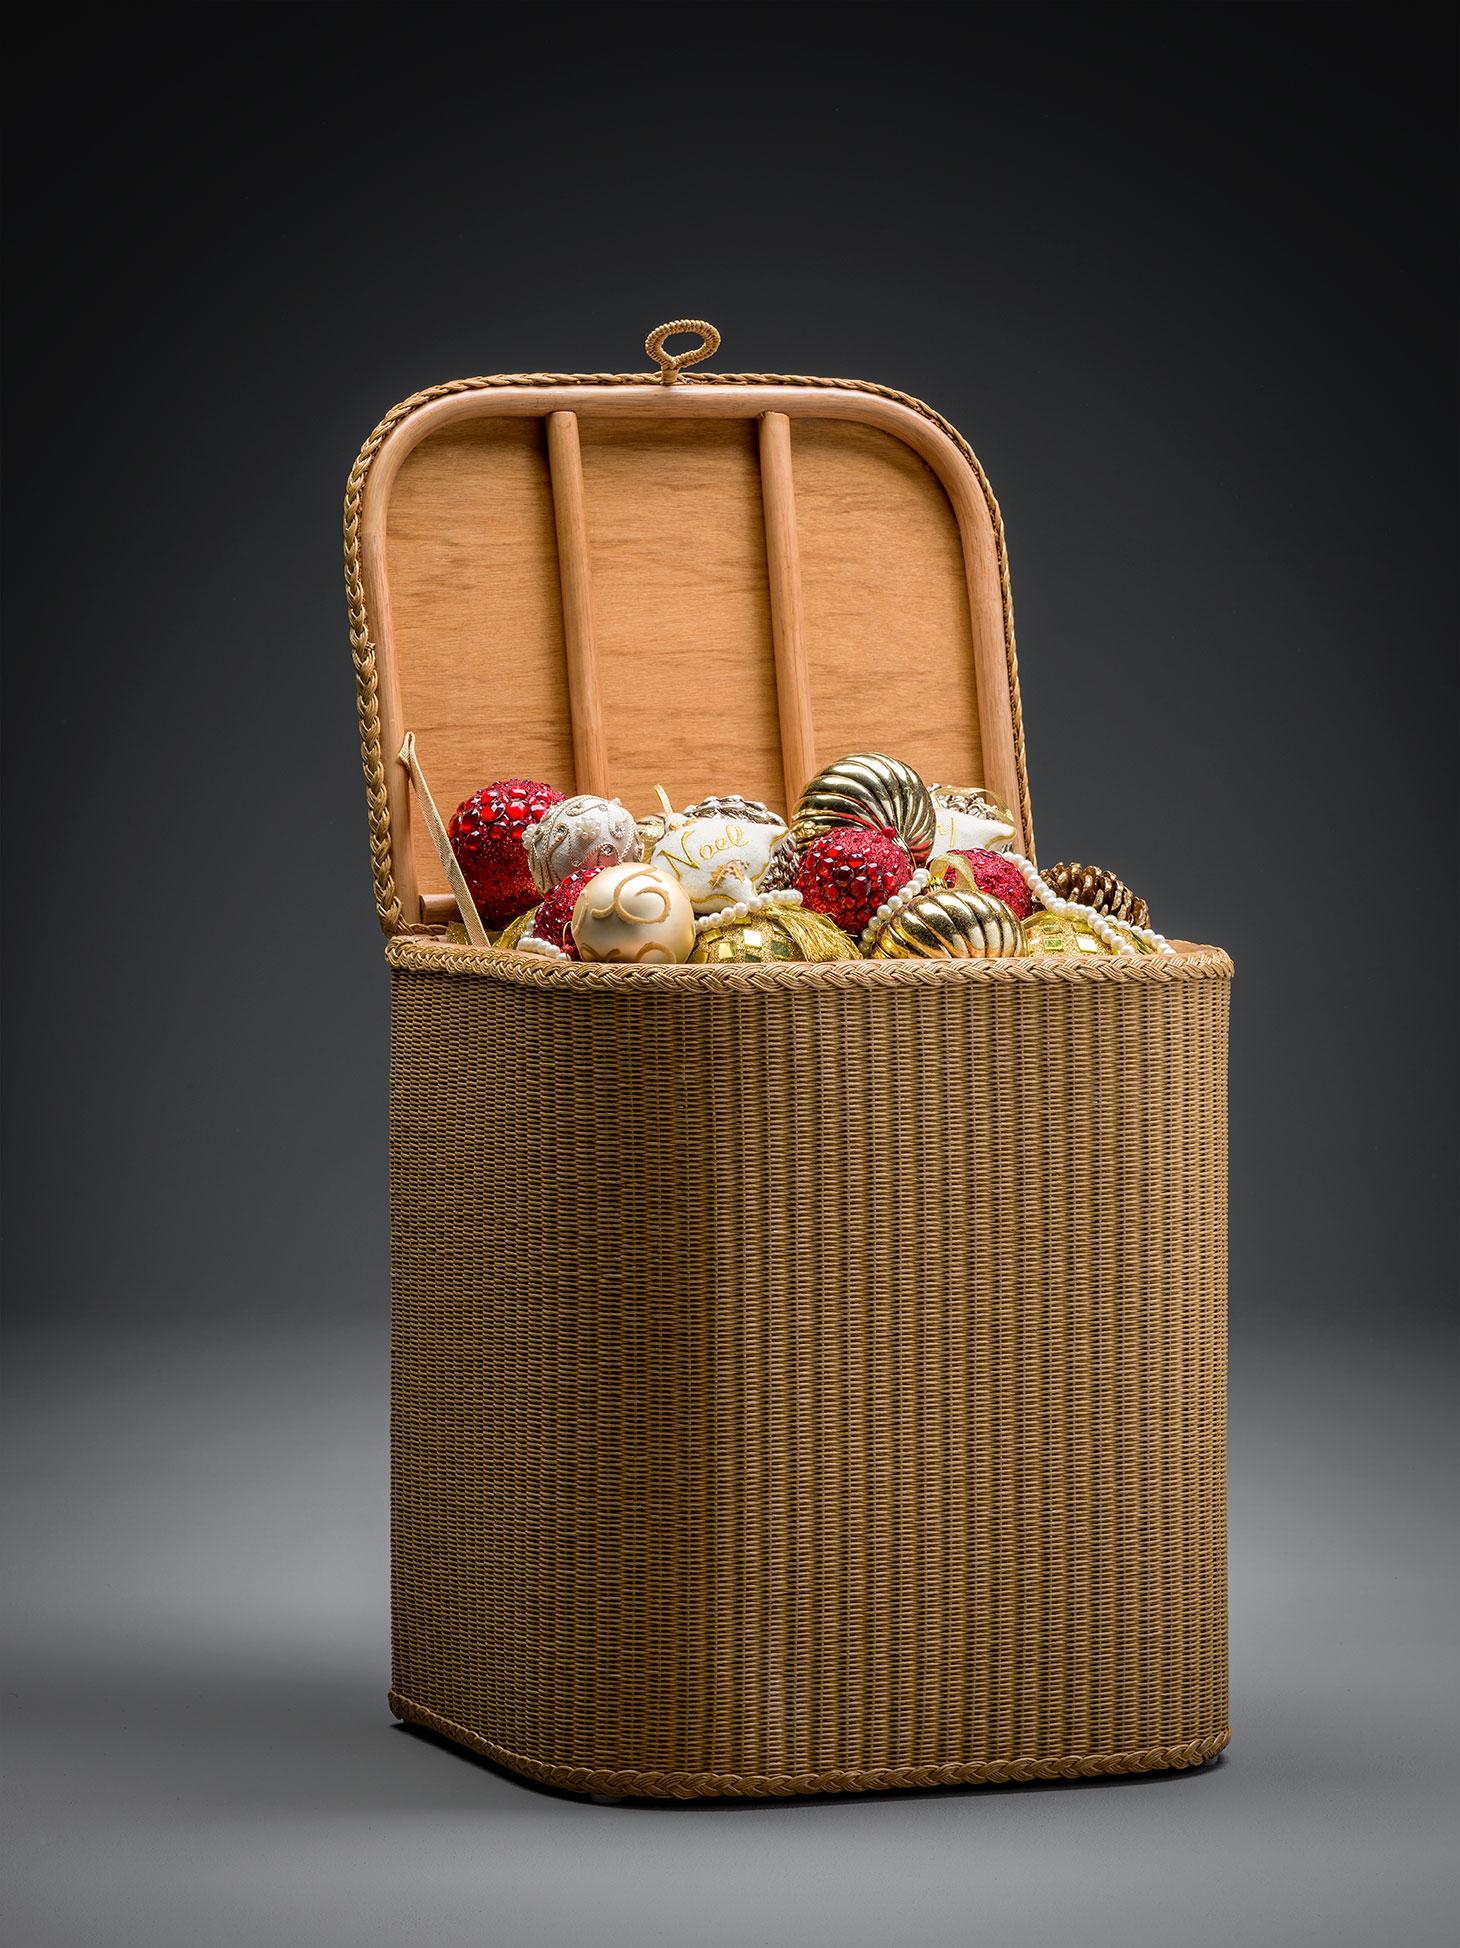 Lloyd Loom Linen Baskets